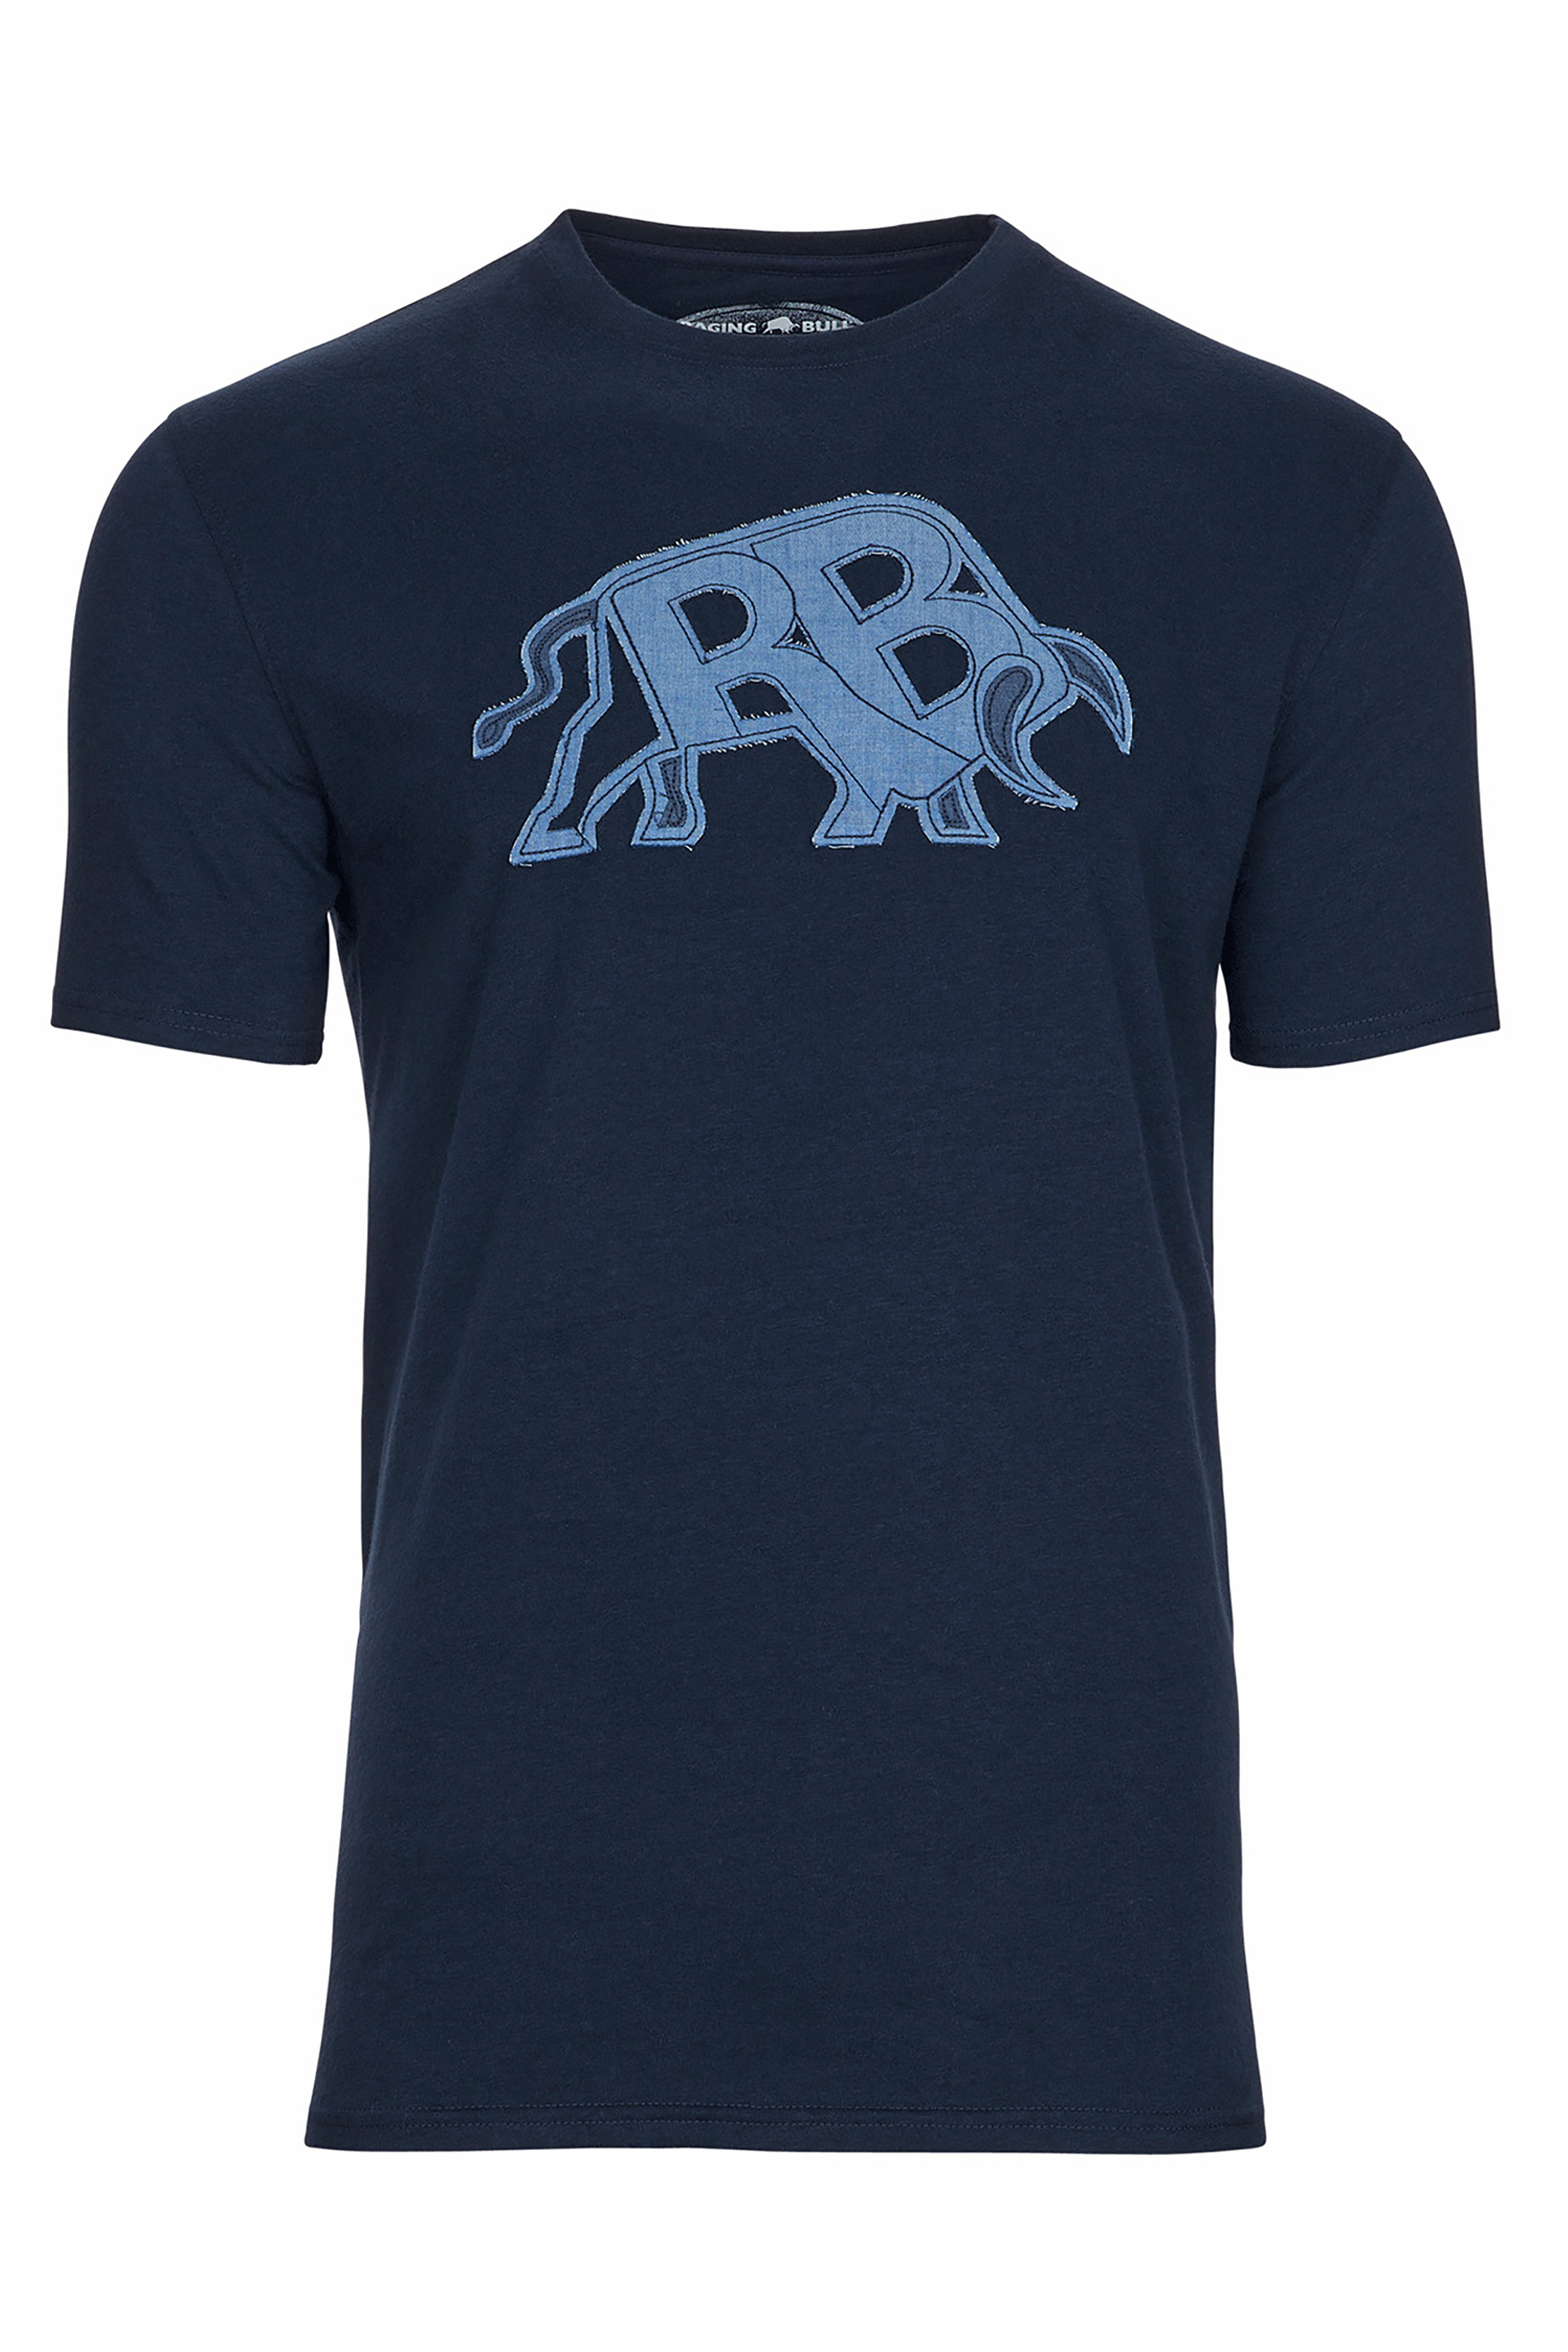 RAGING BULL Navy T-Shirt_F.jpg